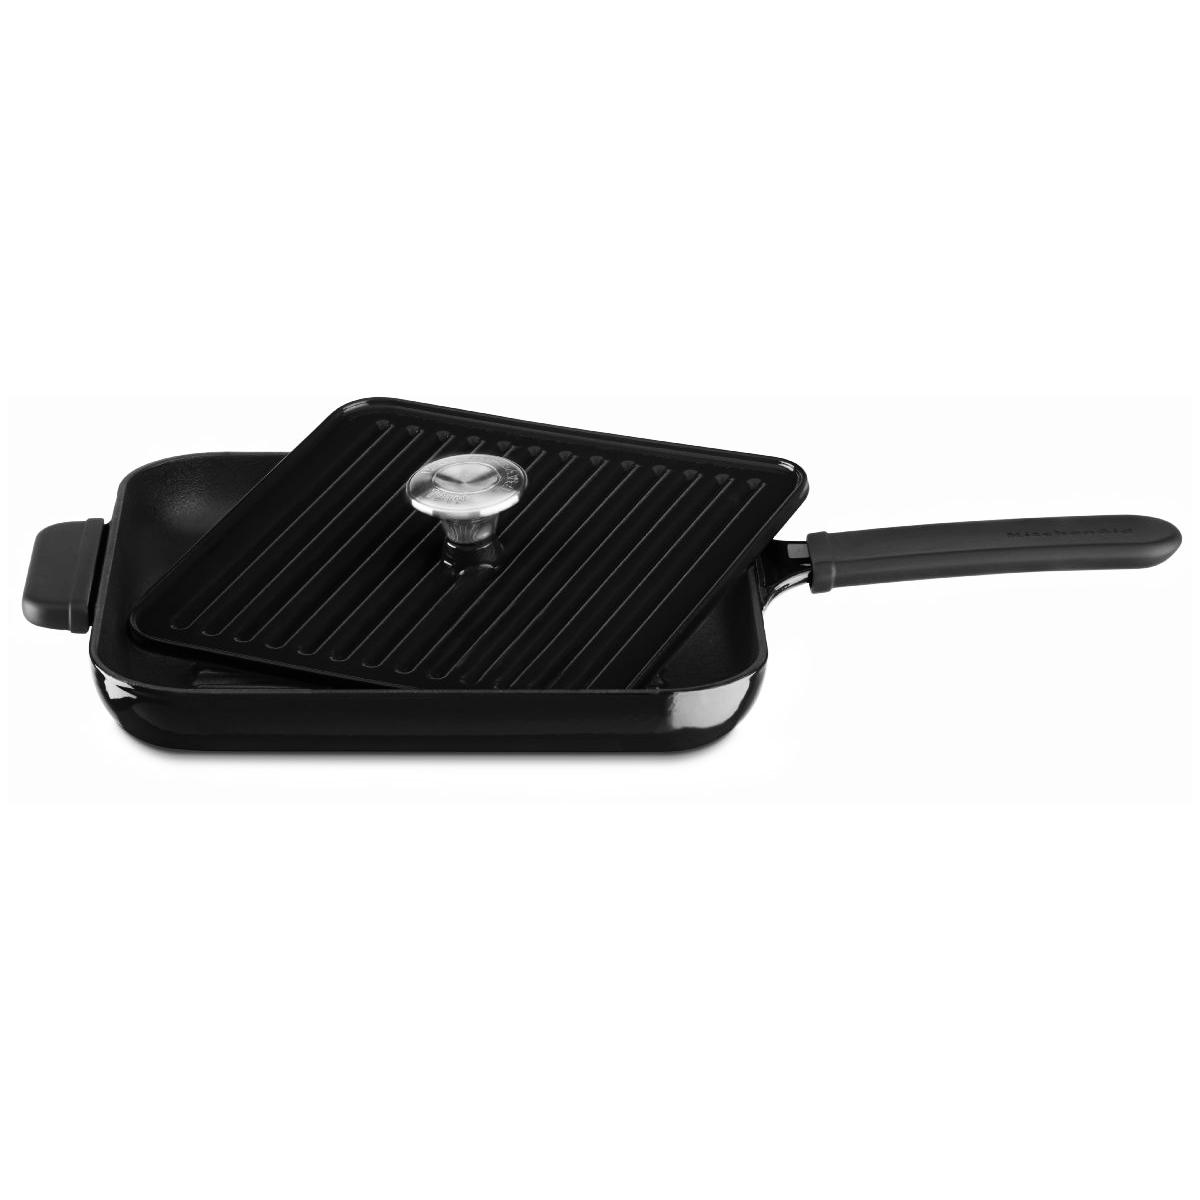 KitchenAid KCI10GPOB Black Onyx Cast Iron Grill Pan and Panini Press